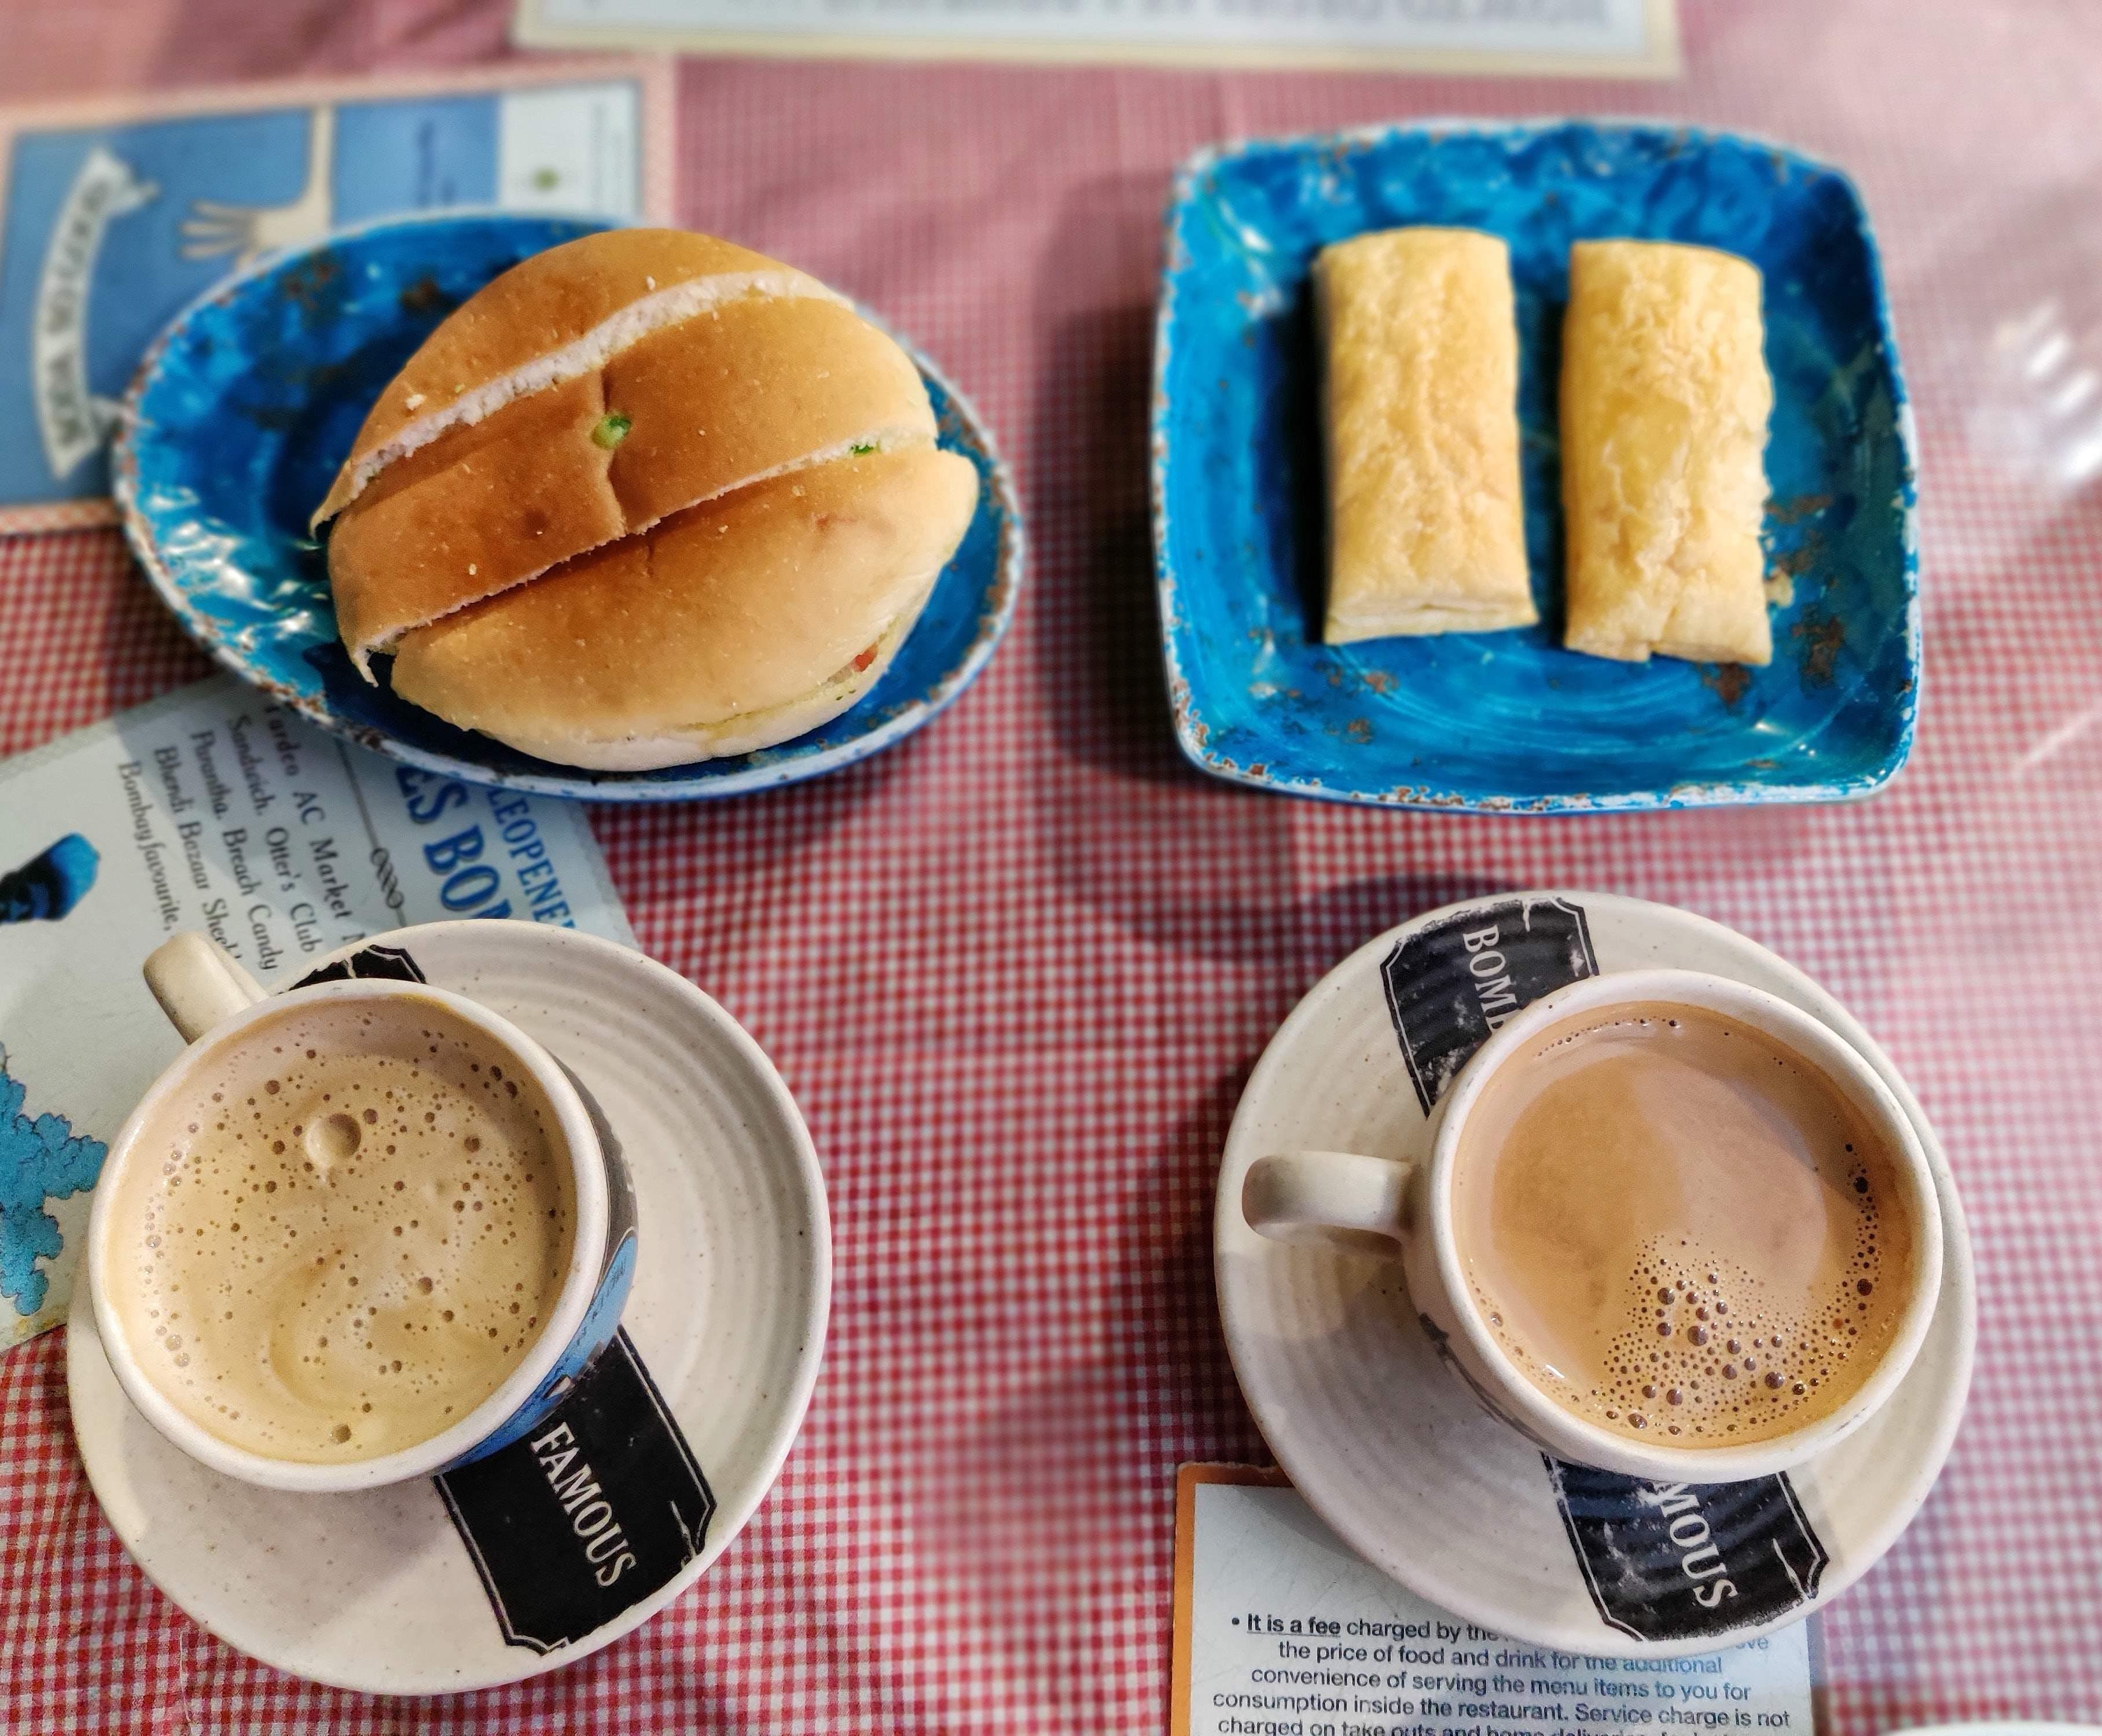 Food,Cuisine,Dish,Ingredient,Cup,Brunch,Breakfast,Coffee cup,Meal,Café au lait